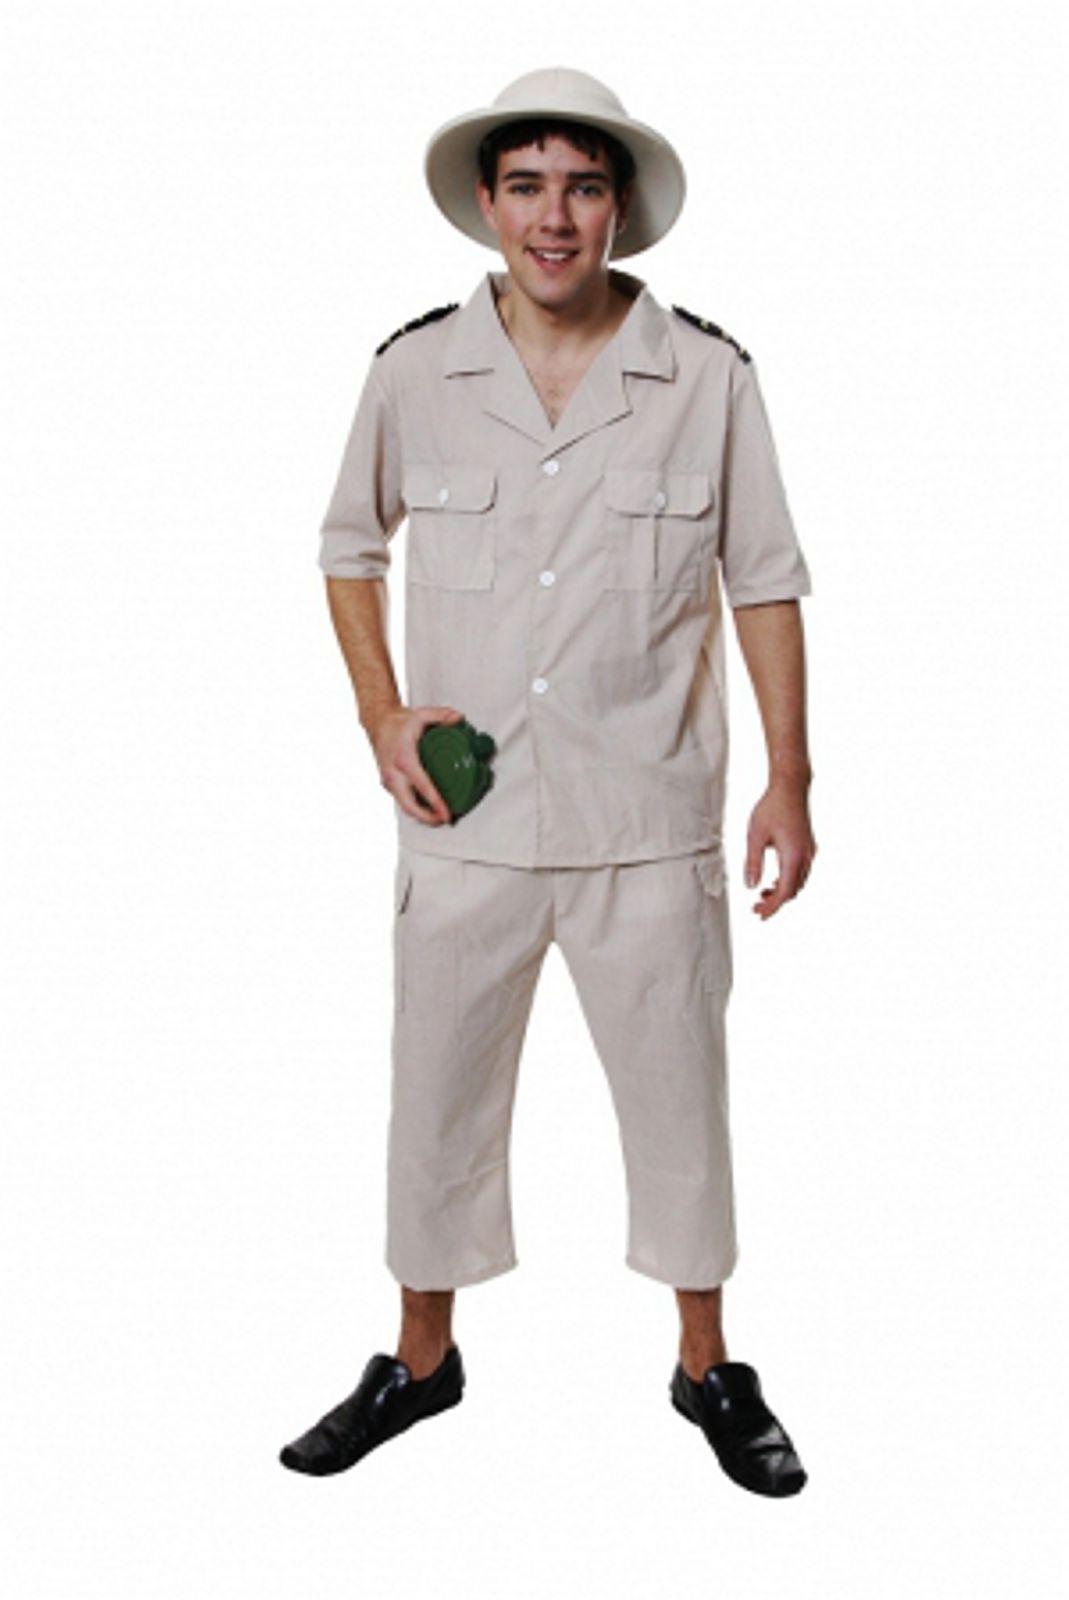 Zoo Keeper Costumes (for Men, Women, Kids) | Parties Costume